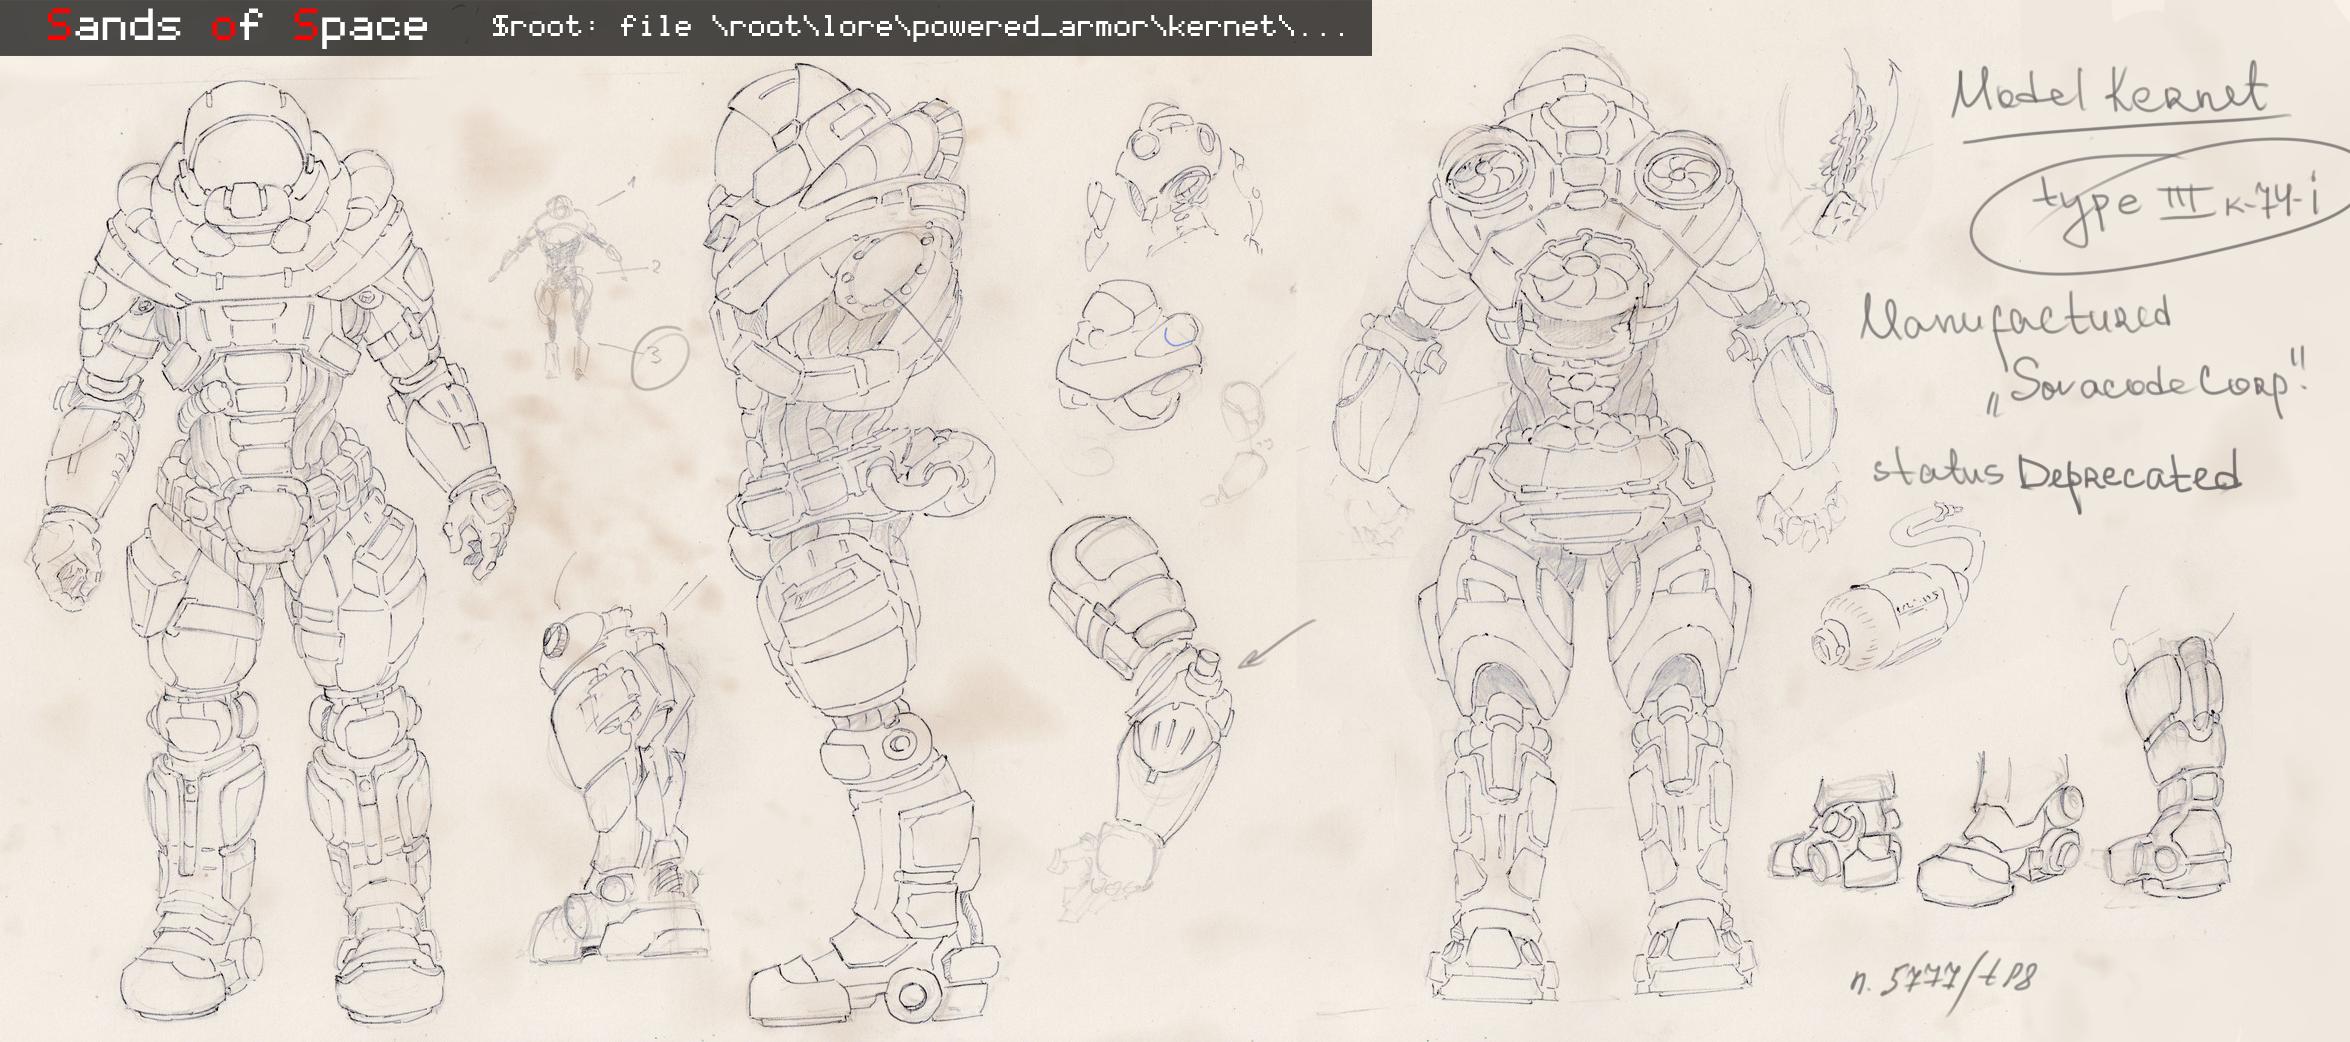 Concept of Kernet Power Armor